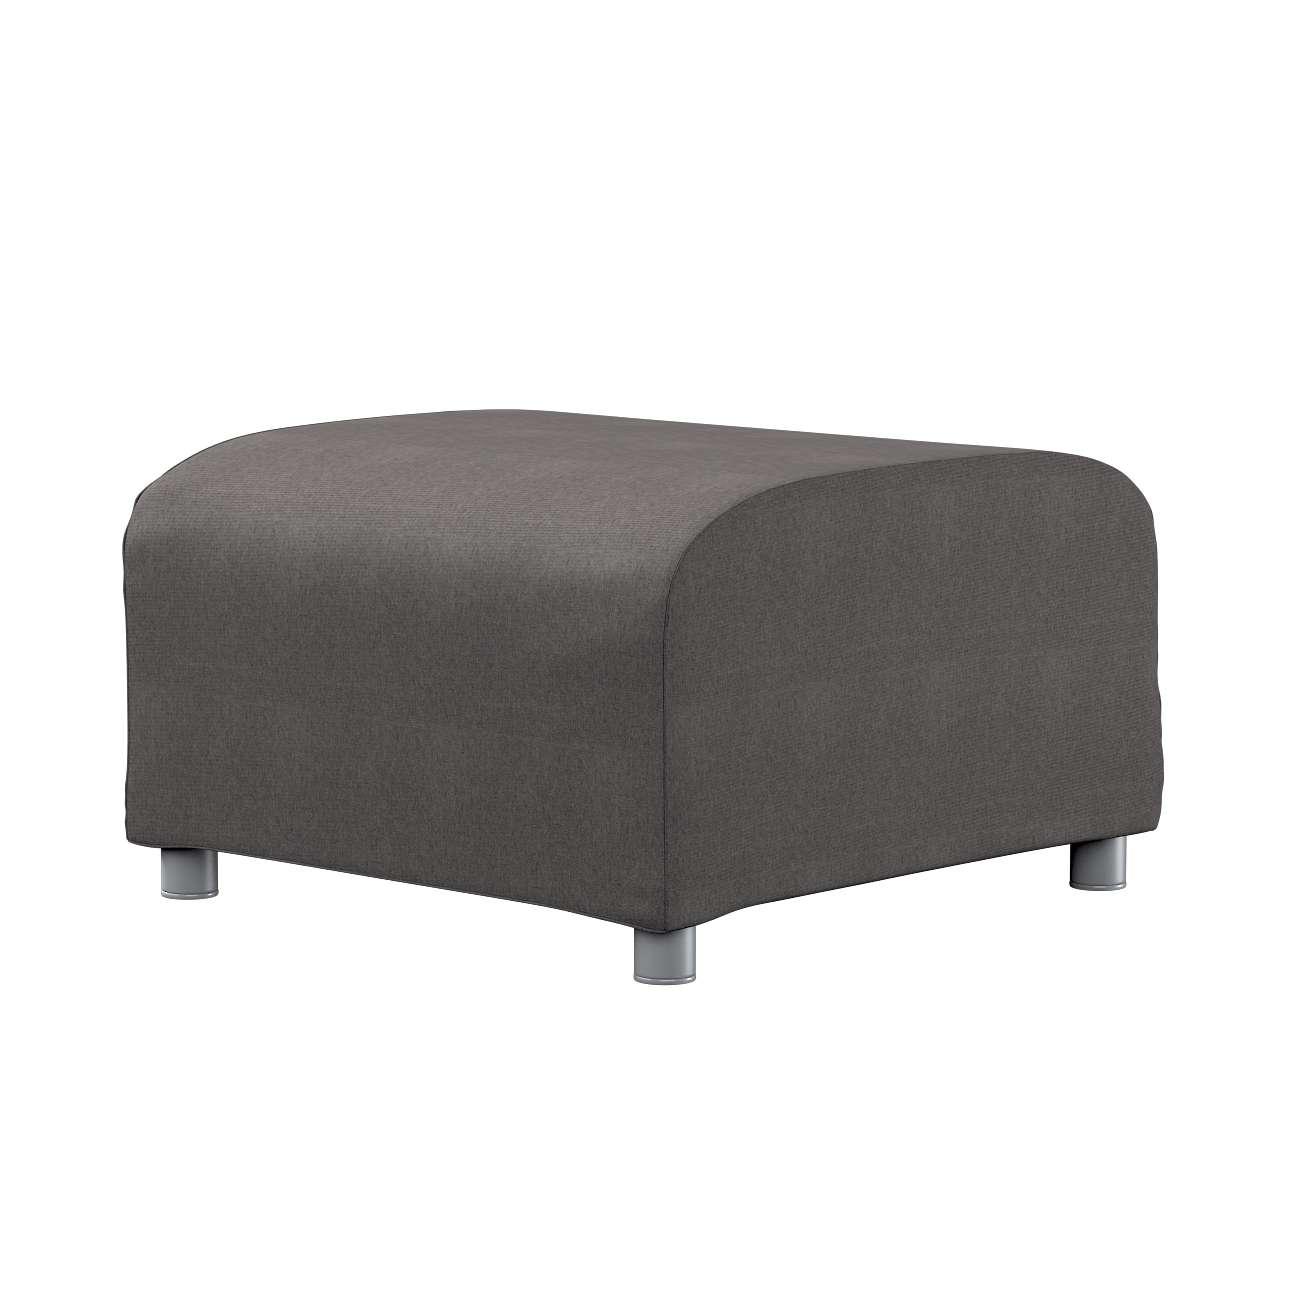 KLIPPAN pufo užvalkalas Klippan footstool cover kolekcijoje Etna , audinys: 705-35